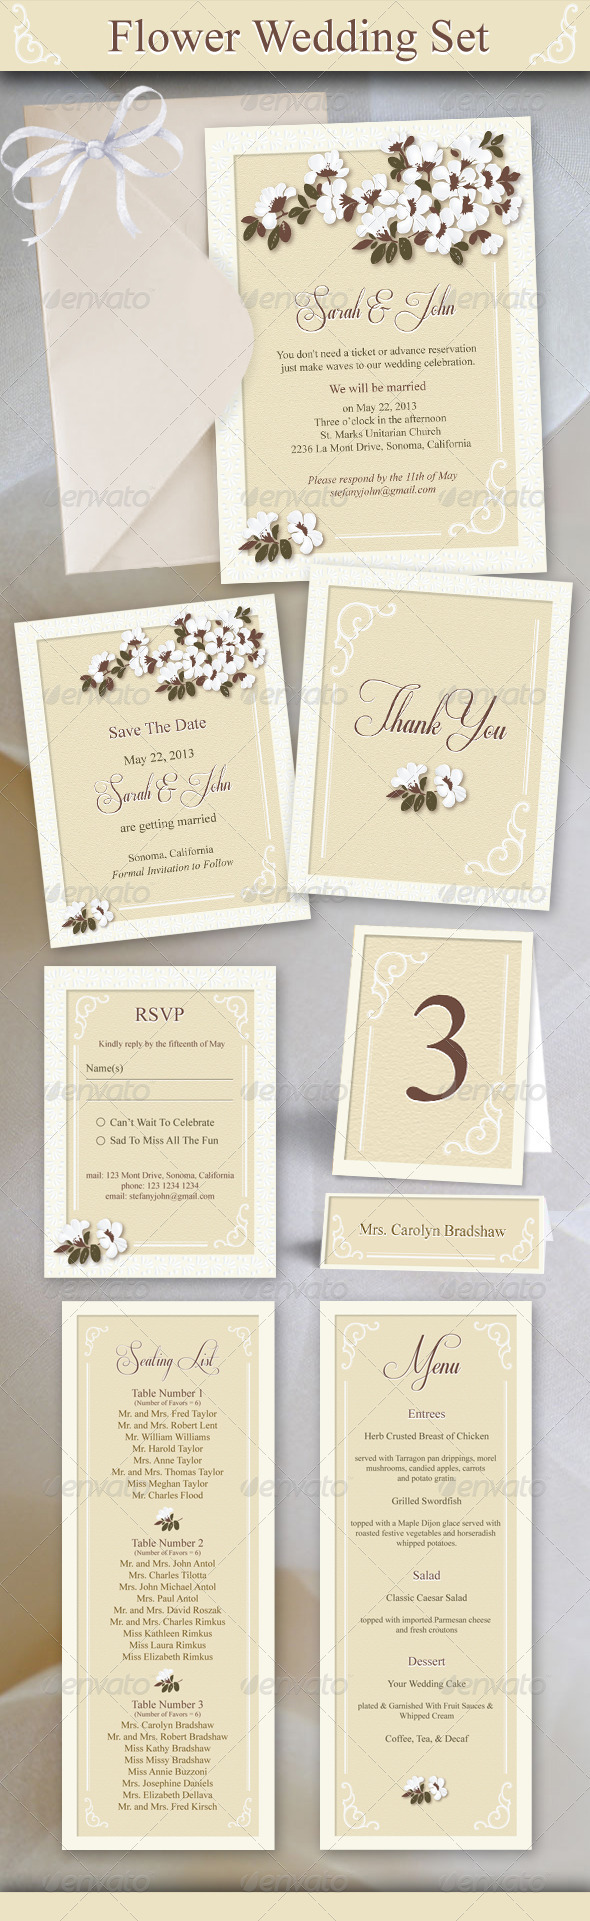 GraphicRiver Flower Wedding Set 3795390